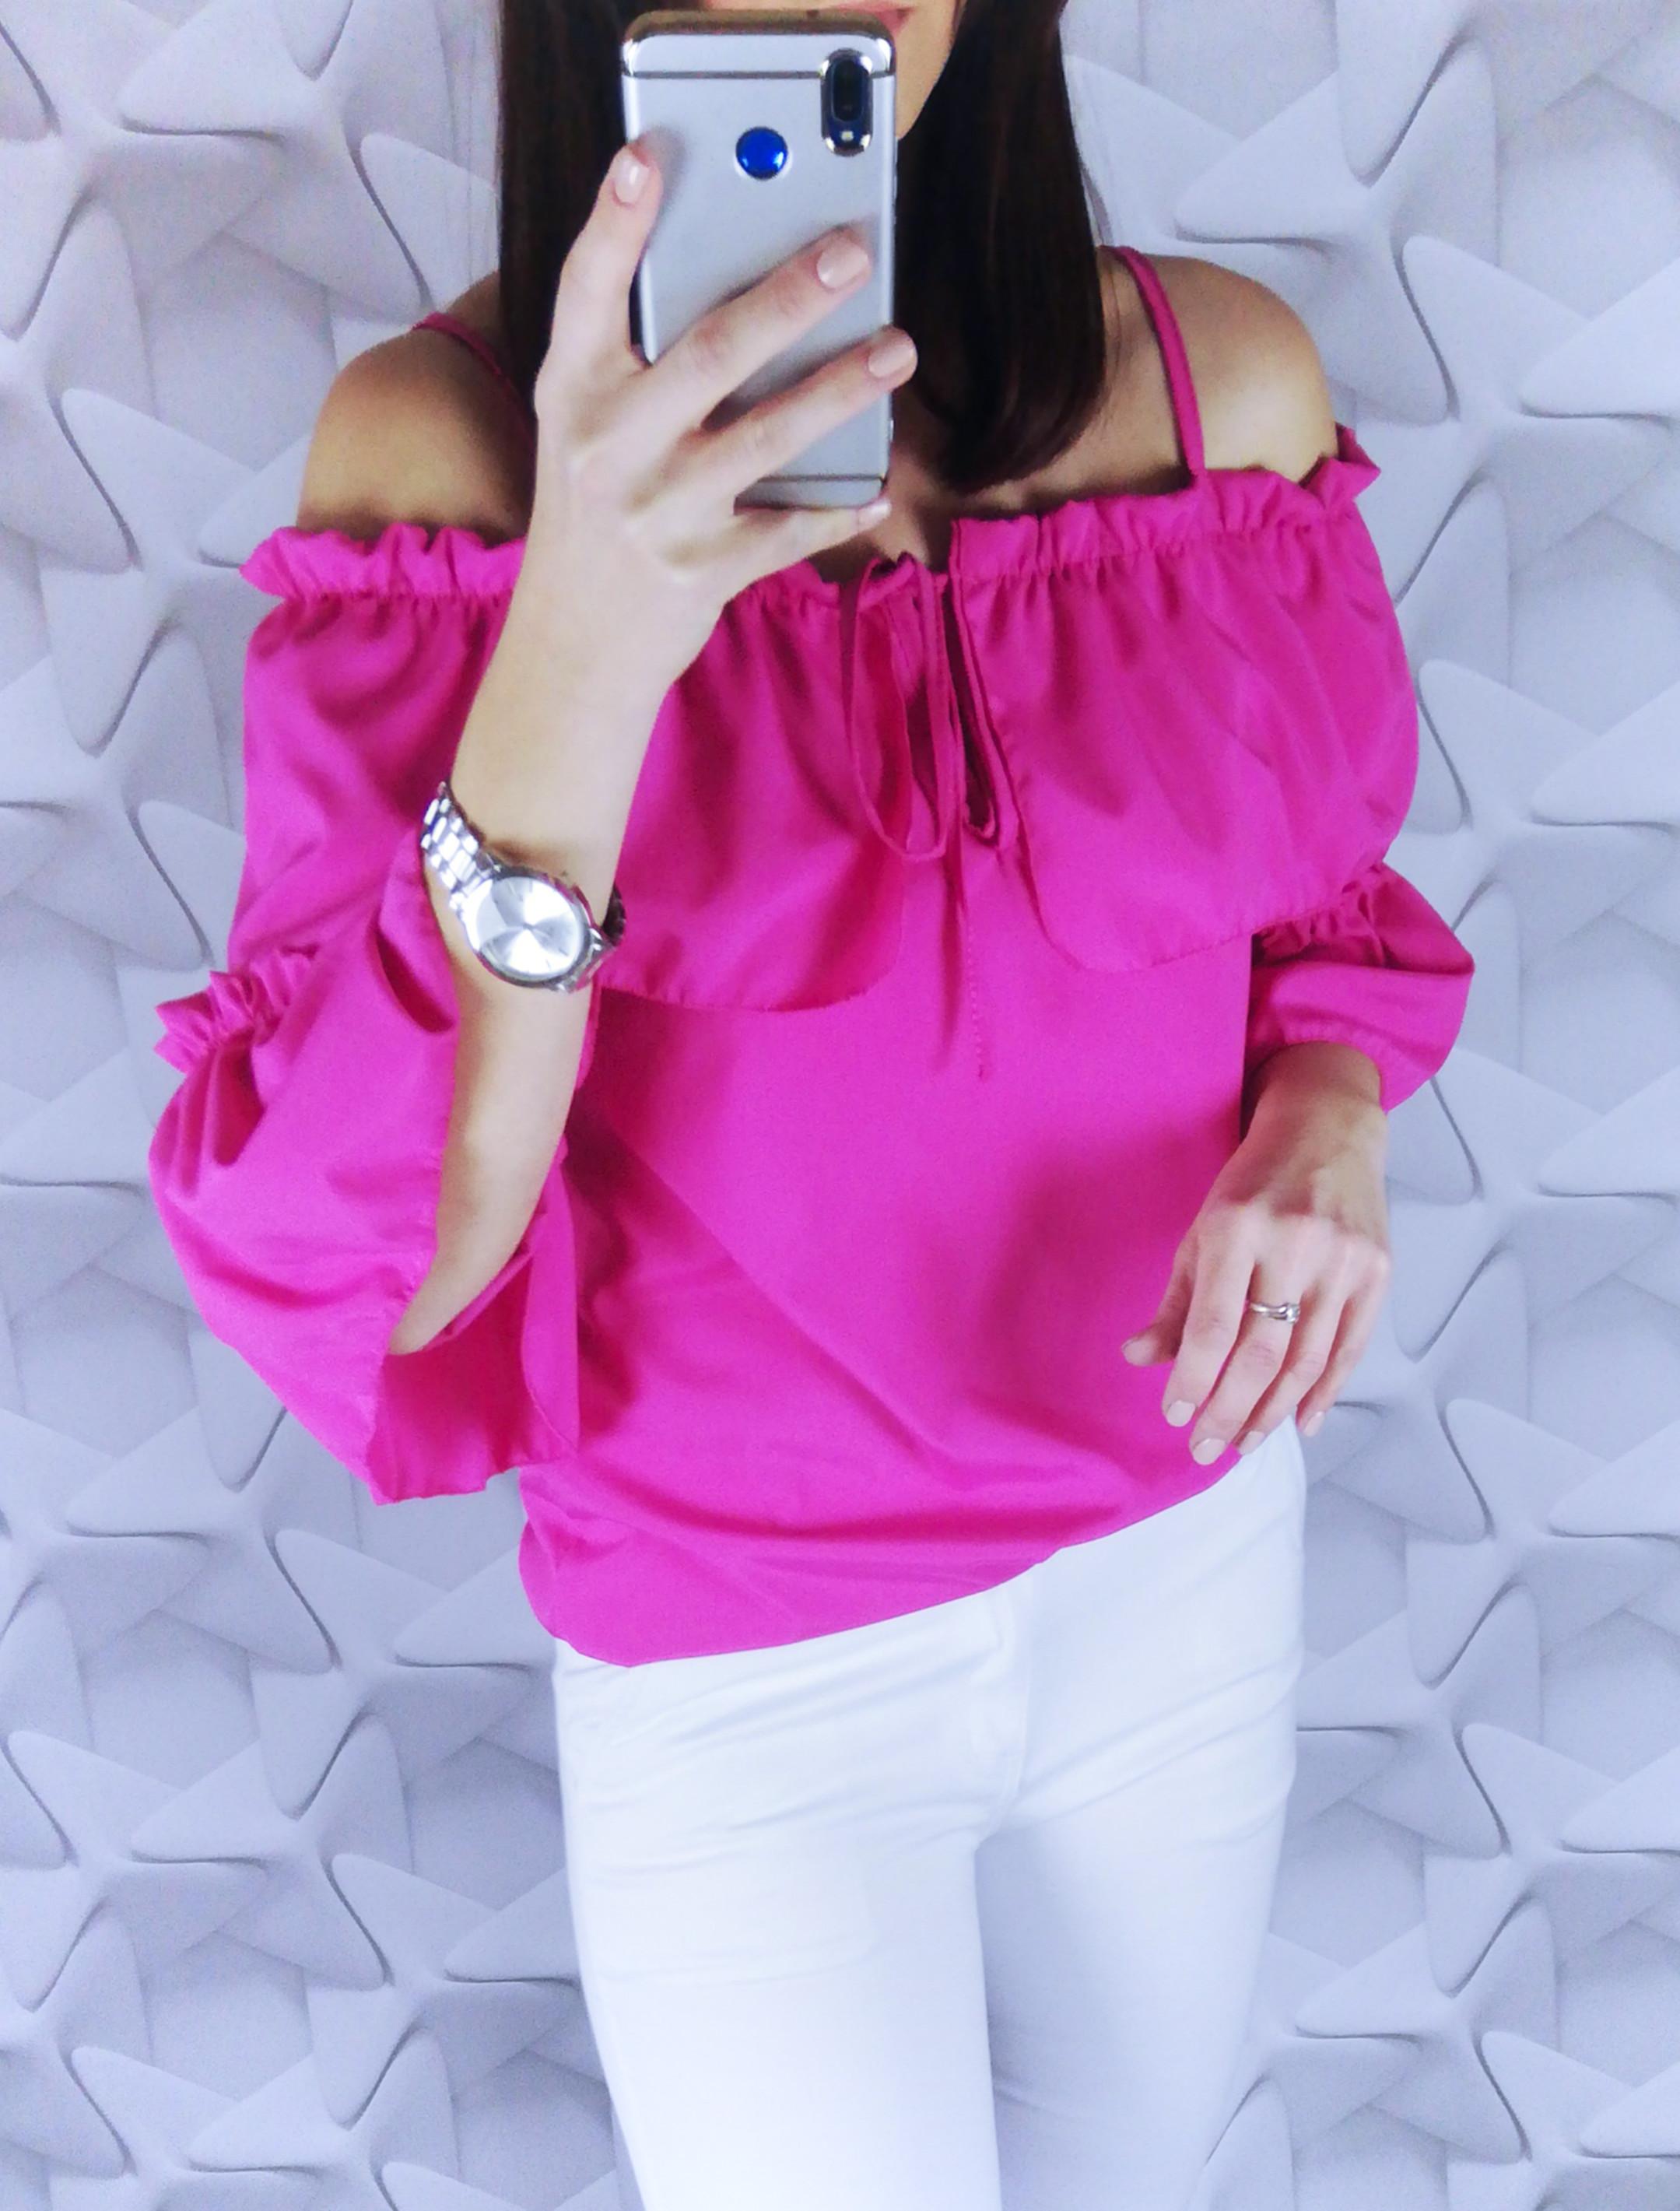 dámsky top,dámska blúzka, elegantná dámska blúzka, blúzka s mašľou,biela blúzka,ružová blúzka s odhalenymi ramenami